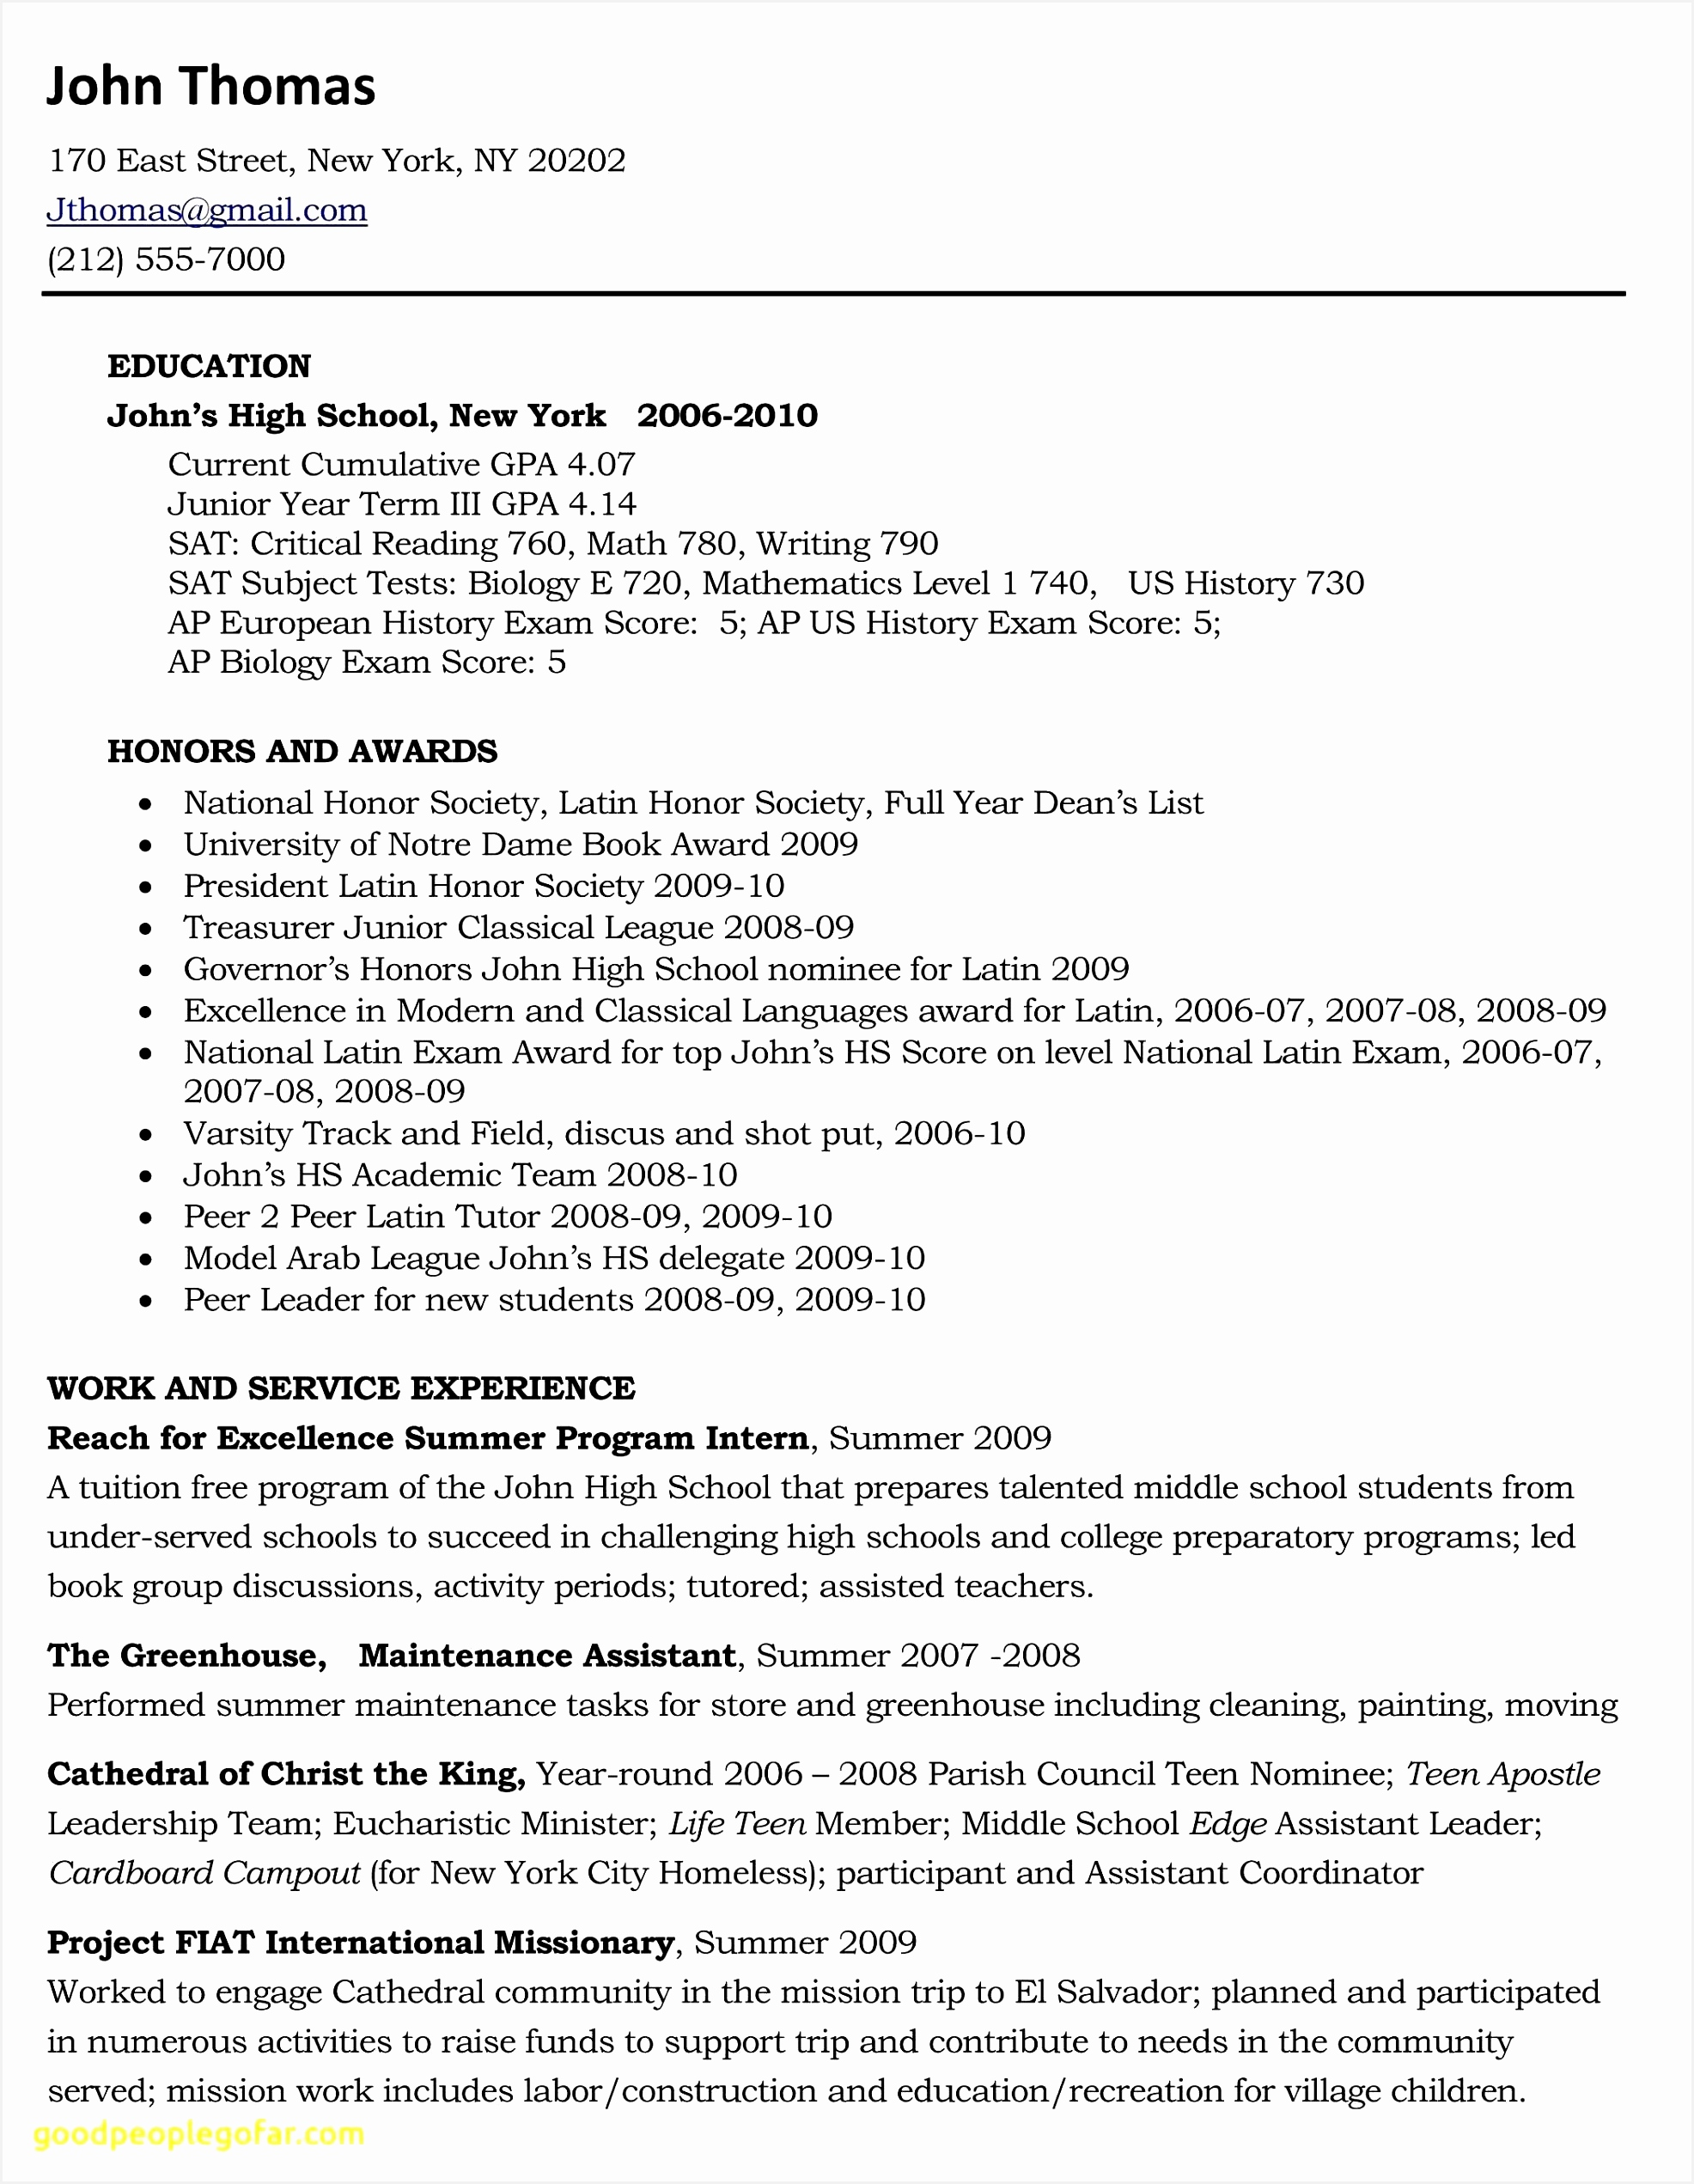 Sorority Resume Examples Inspirationa Make Free Resume Best Fresh Entry Level Resume sorority Resume 0d25421972